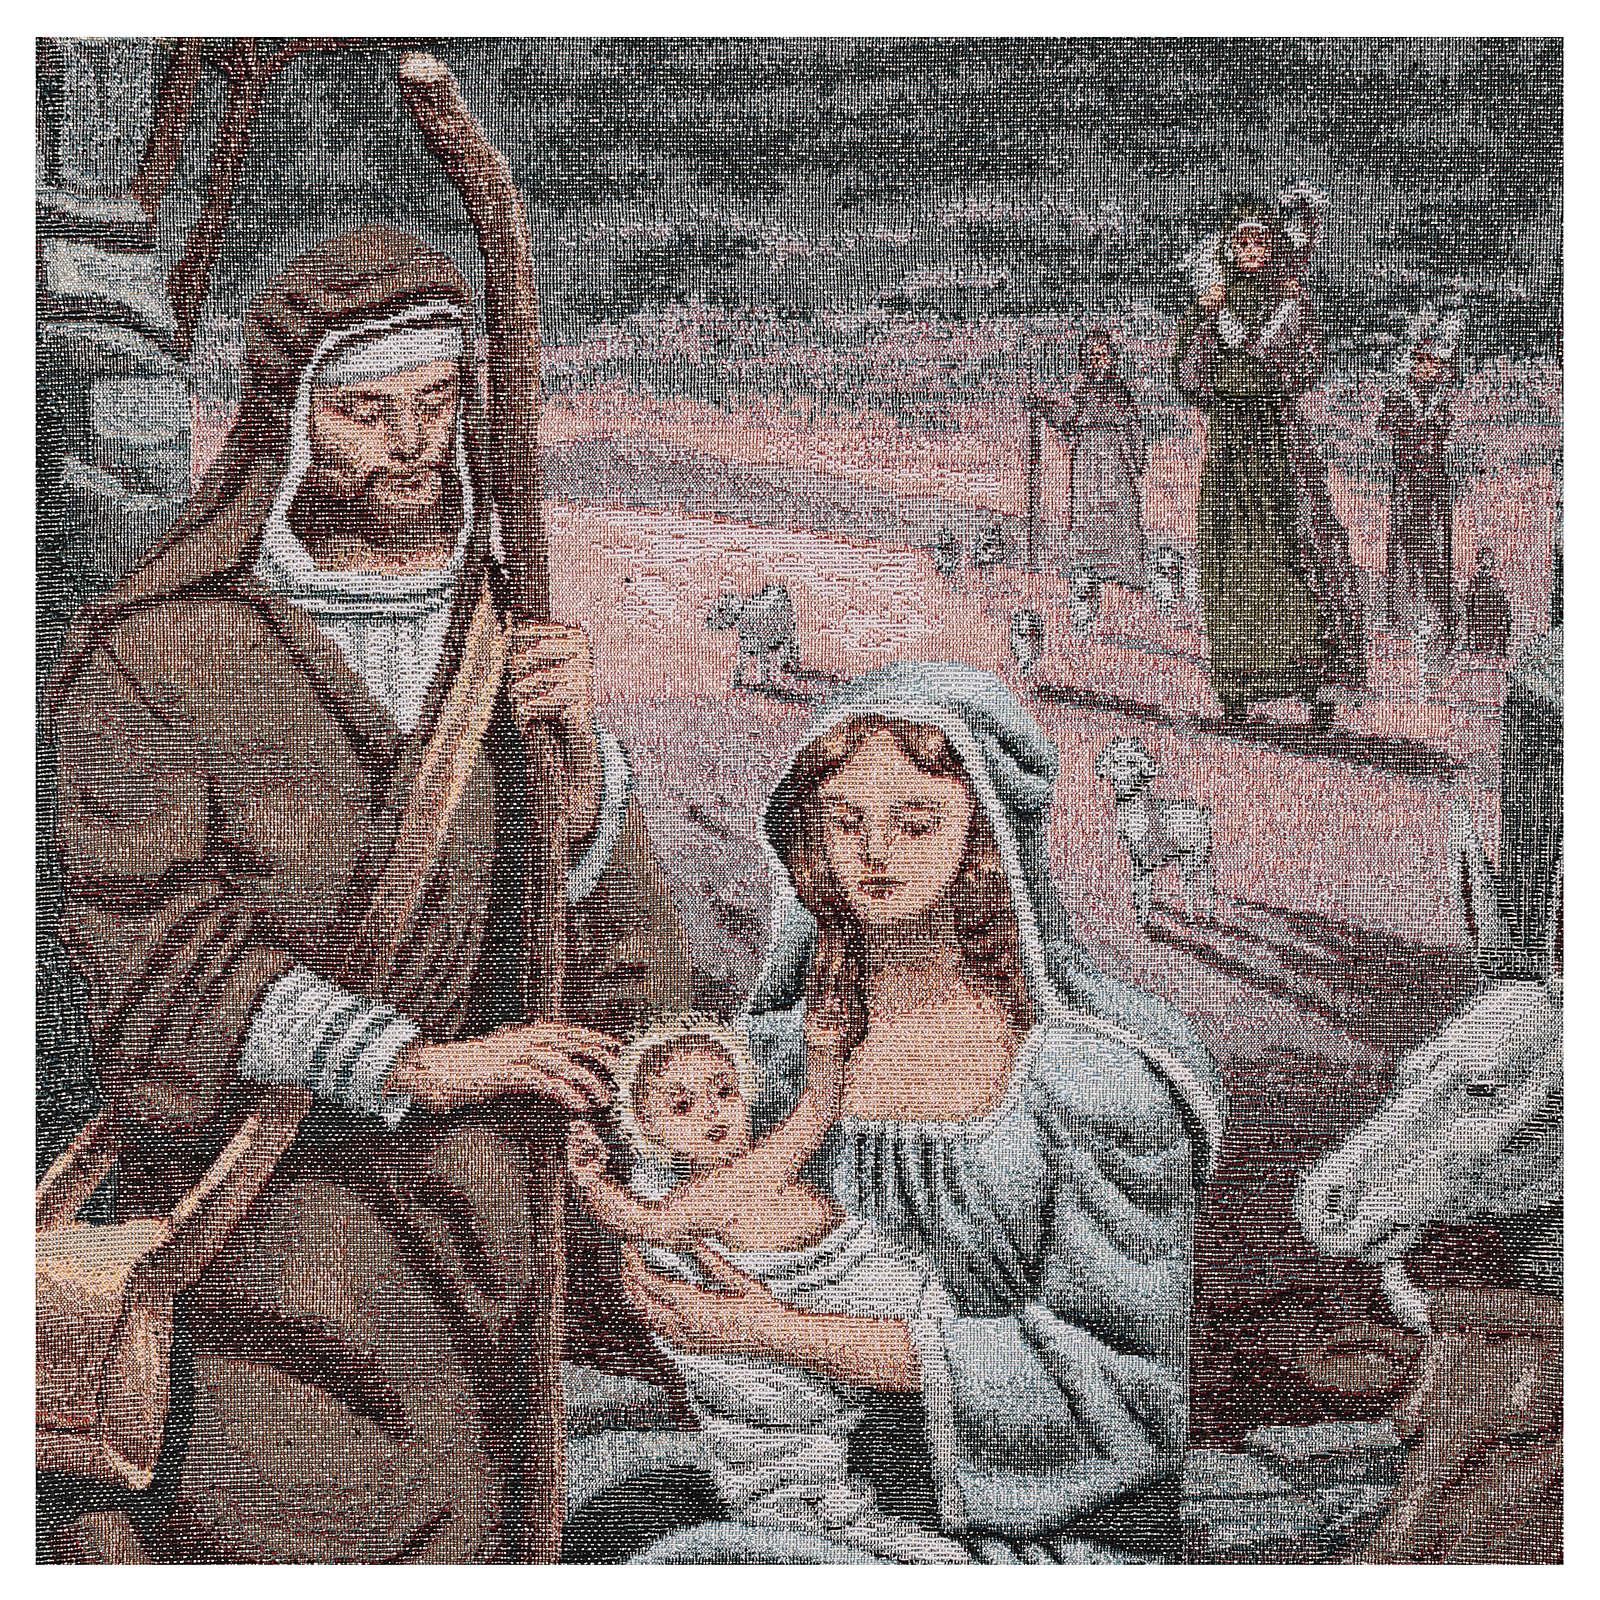 Paño de atril Natividad motivos hilo dorado algodón lurex marfil 4